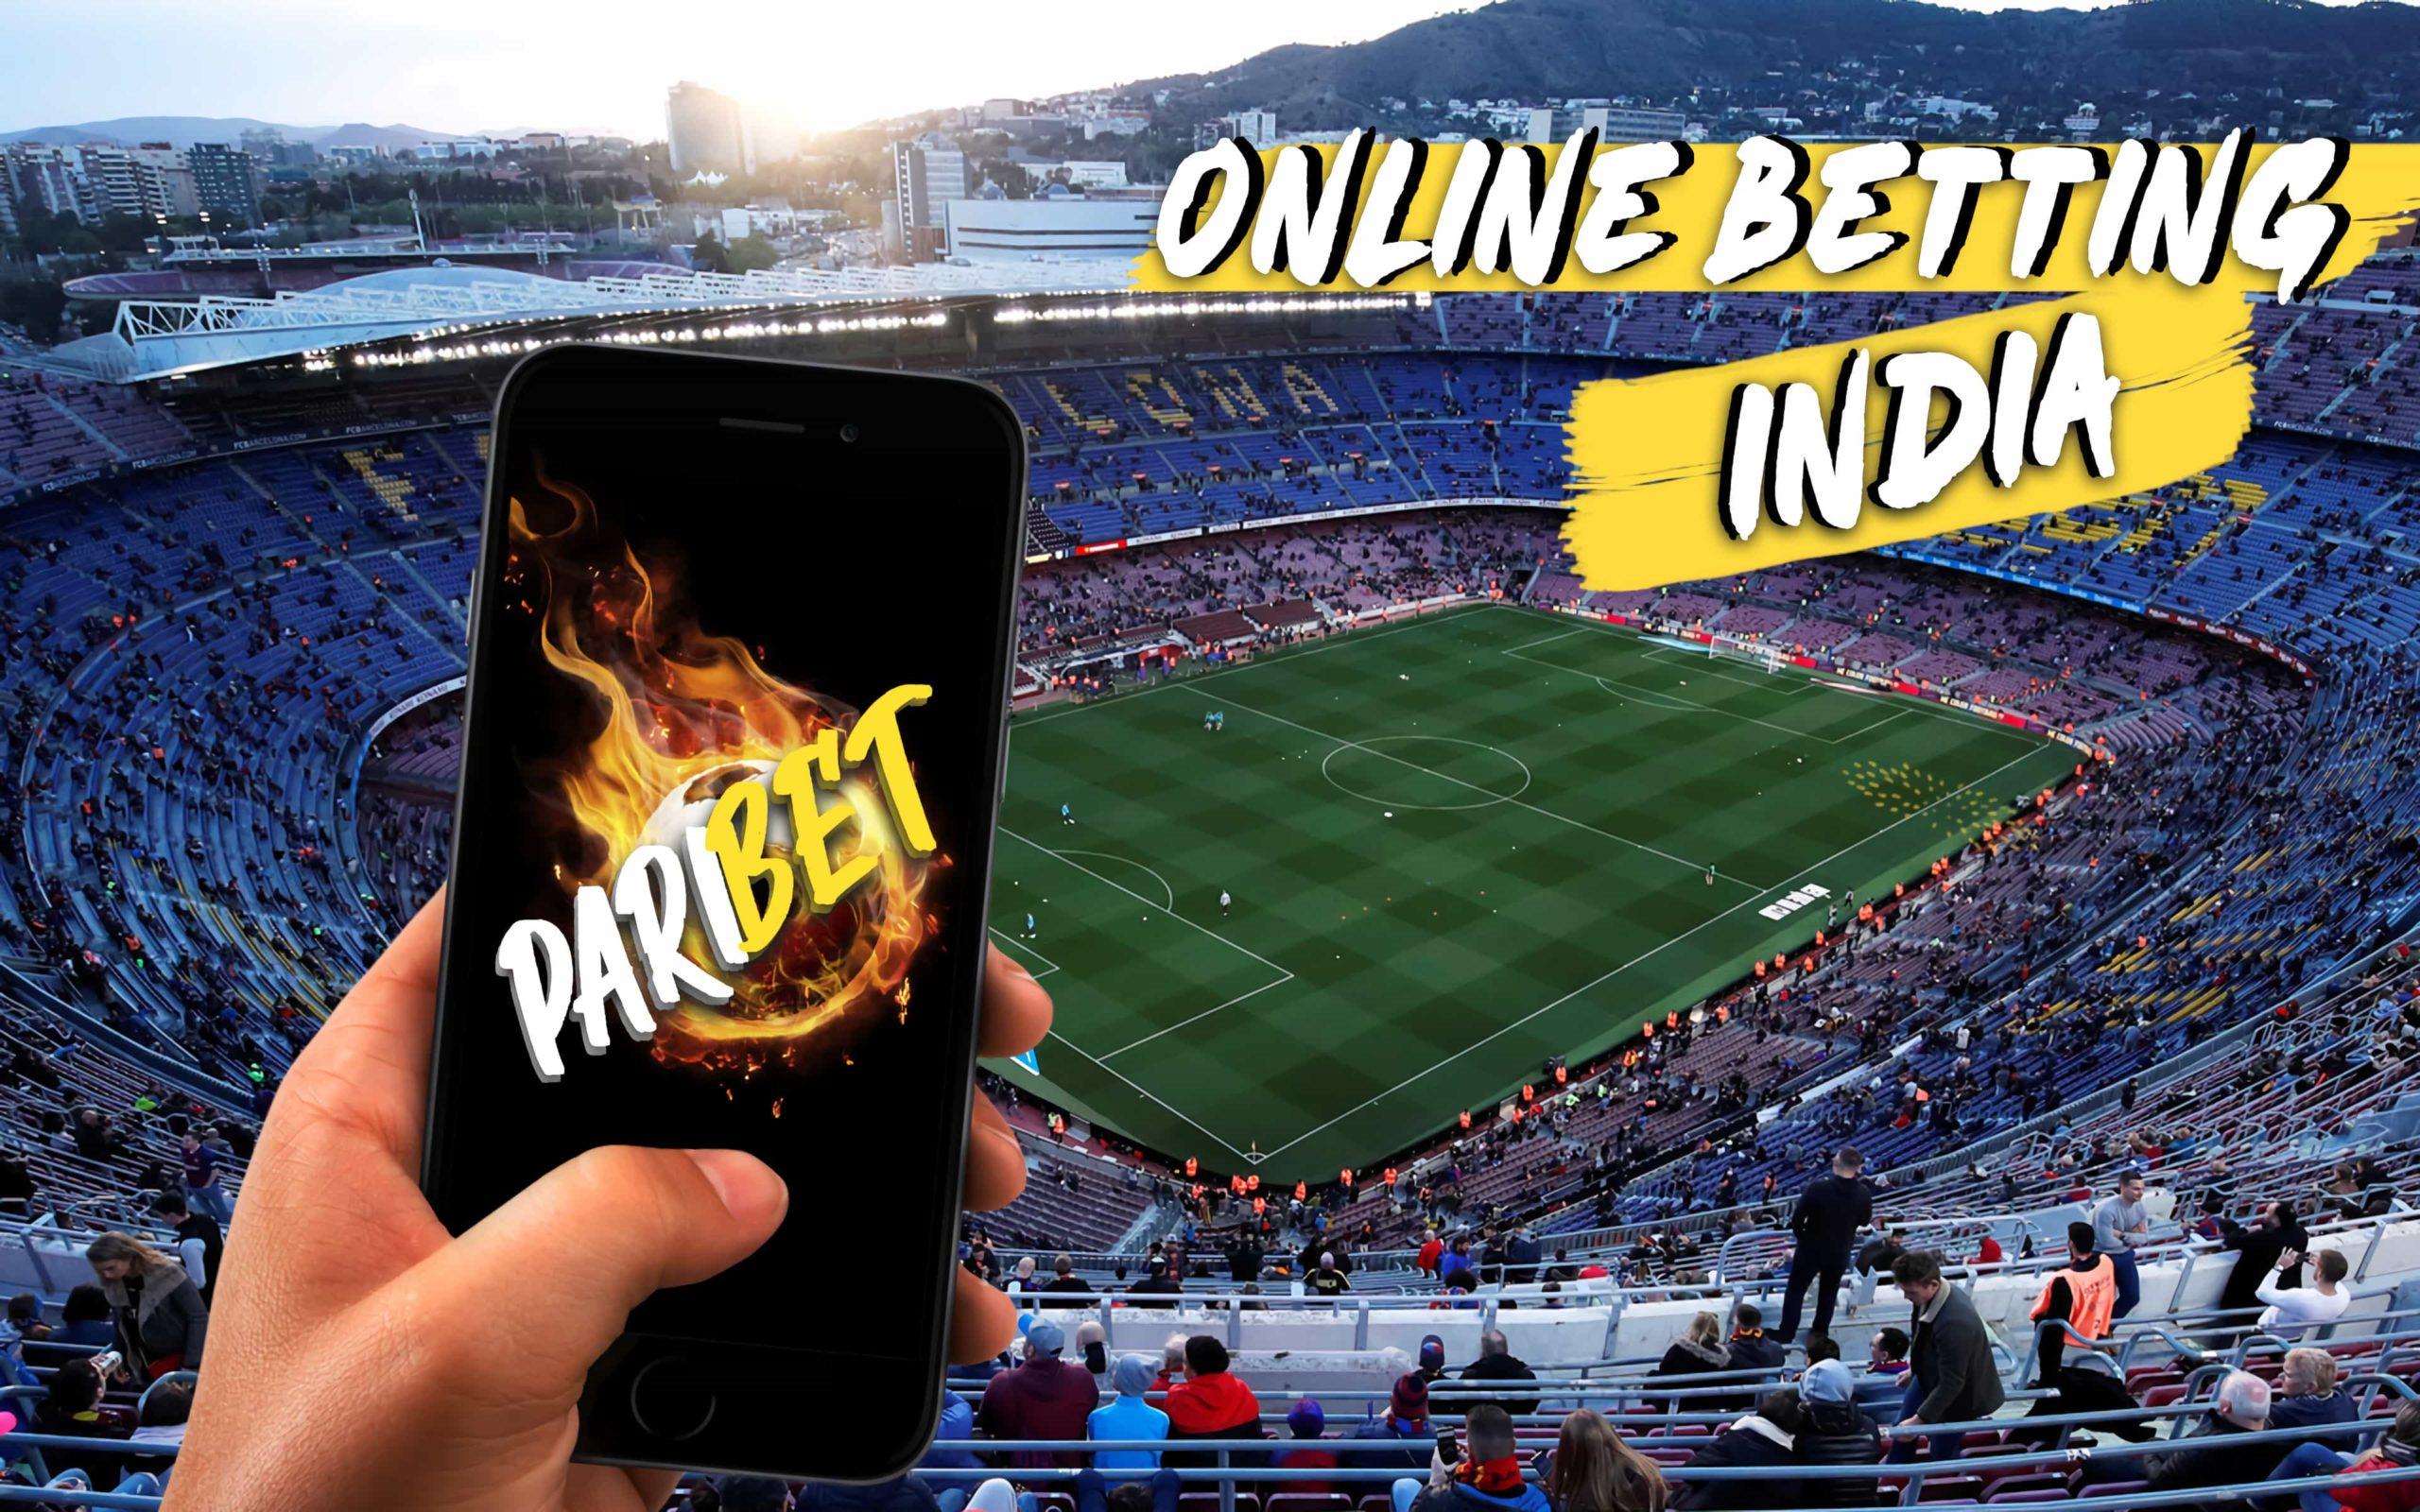 Online betting India with Paribet